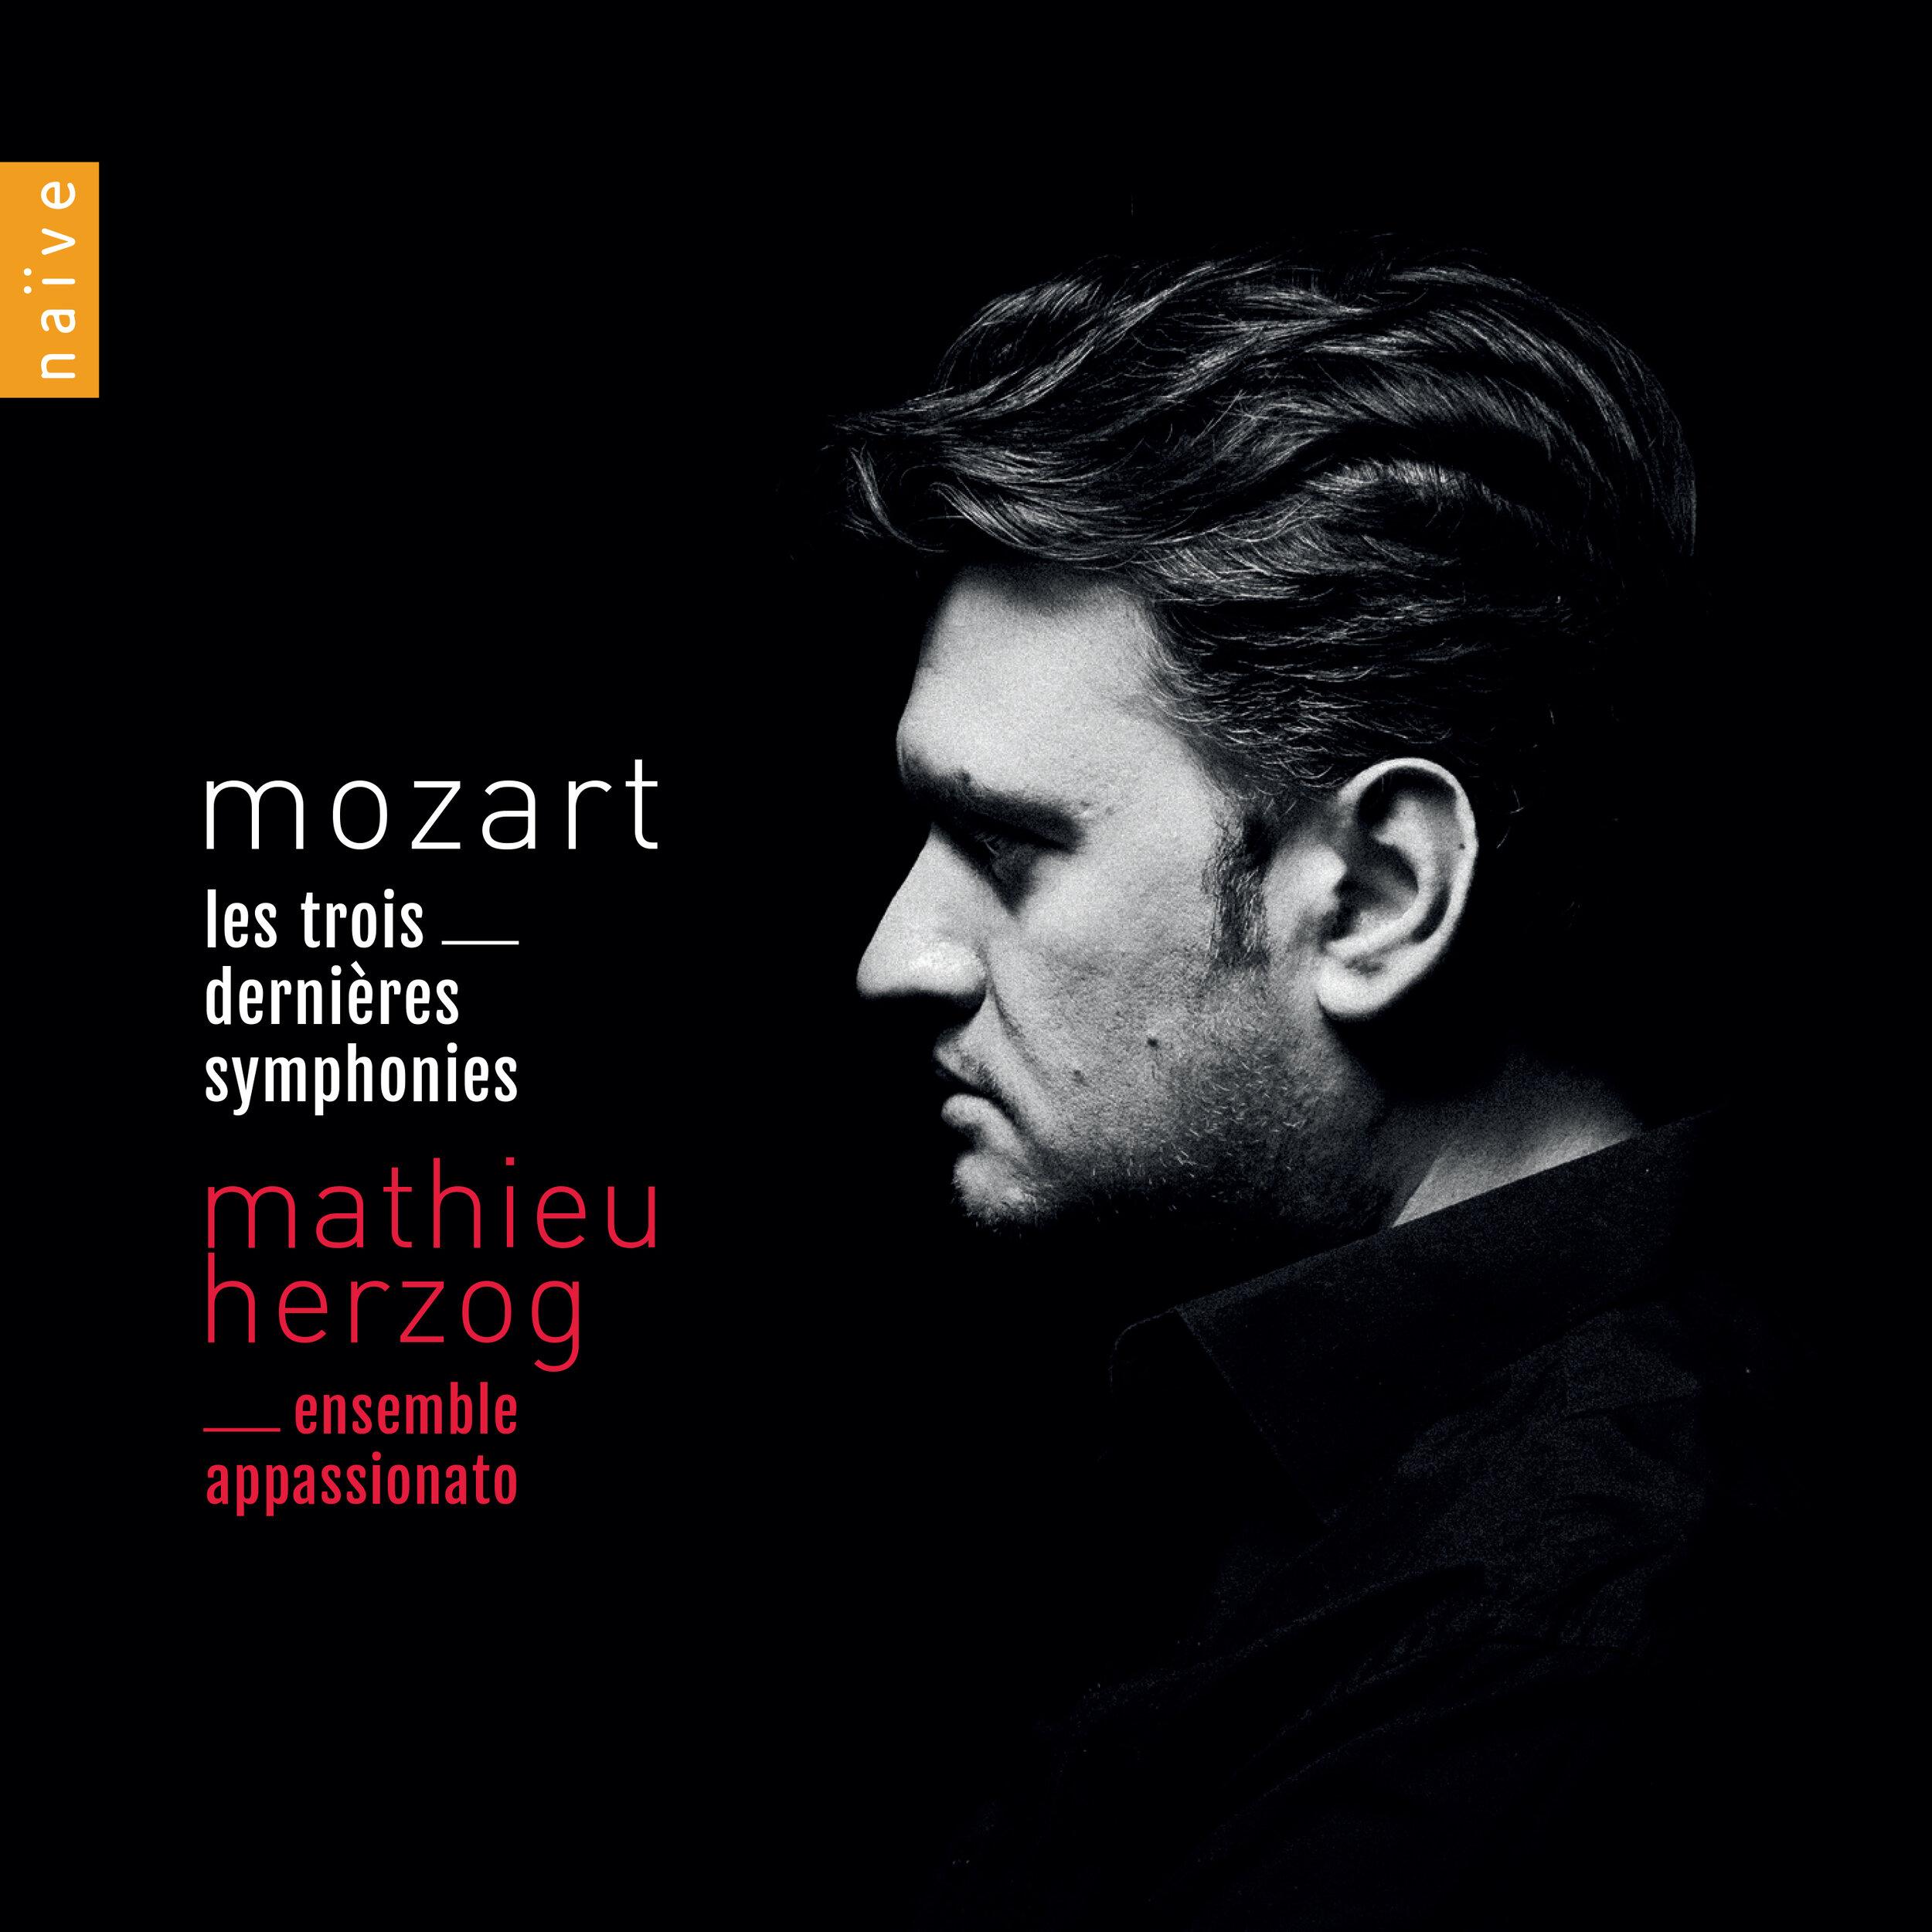 V5457 K Mozart Herzog Ensemble Appassionato - 3000x3000.jpg